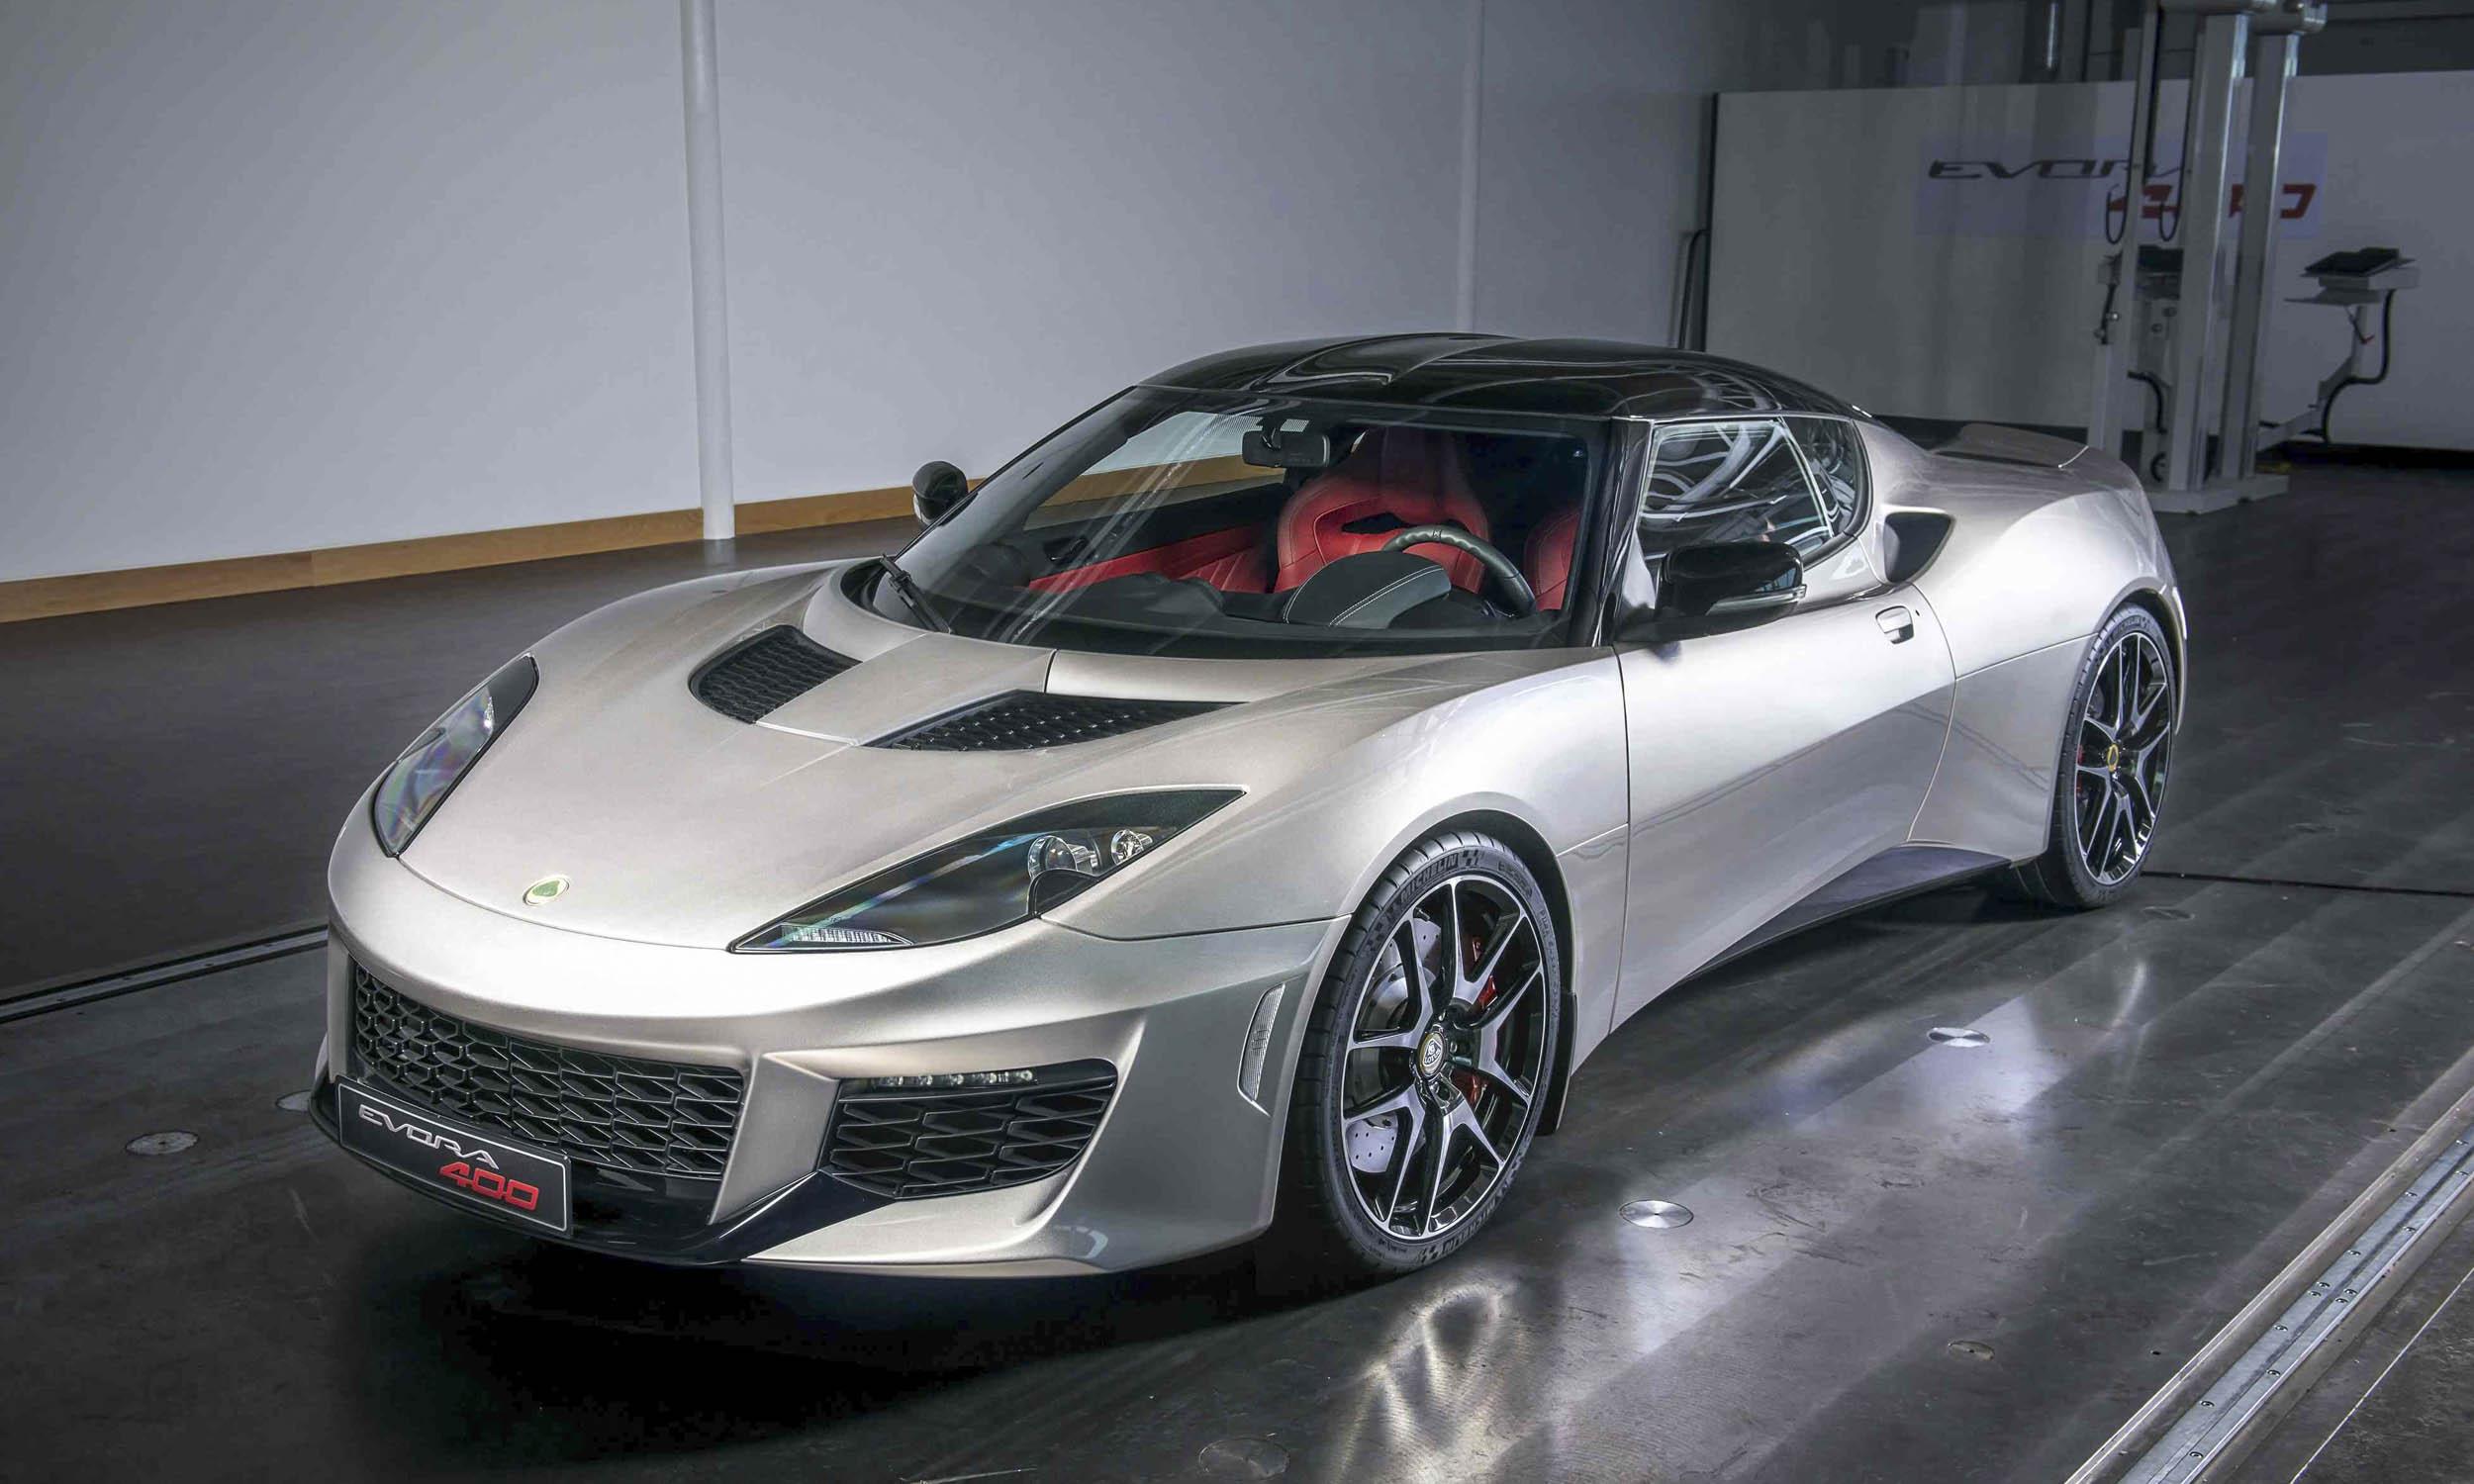 lotus evora 400 msrp $ 89900 lotus made its mark producing lightweight ...